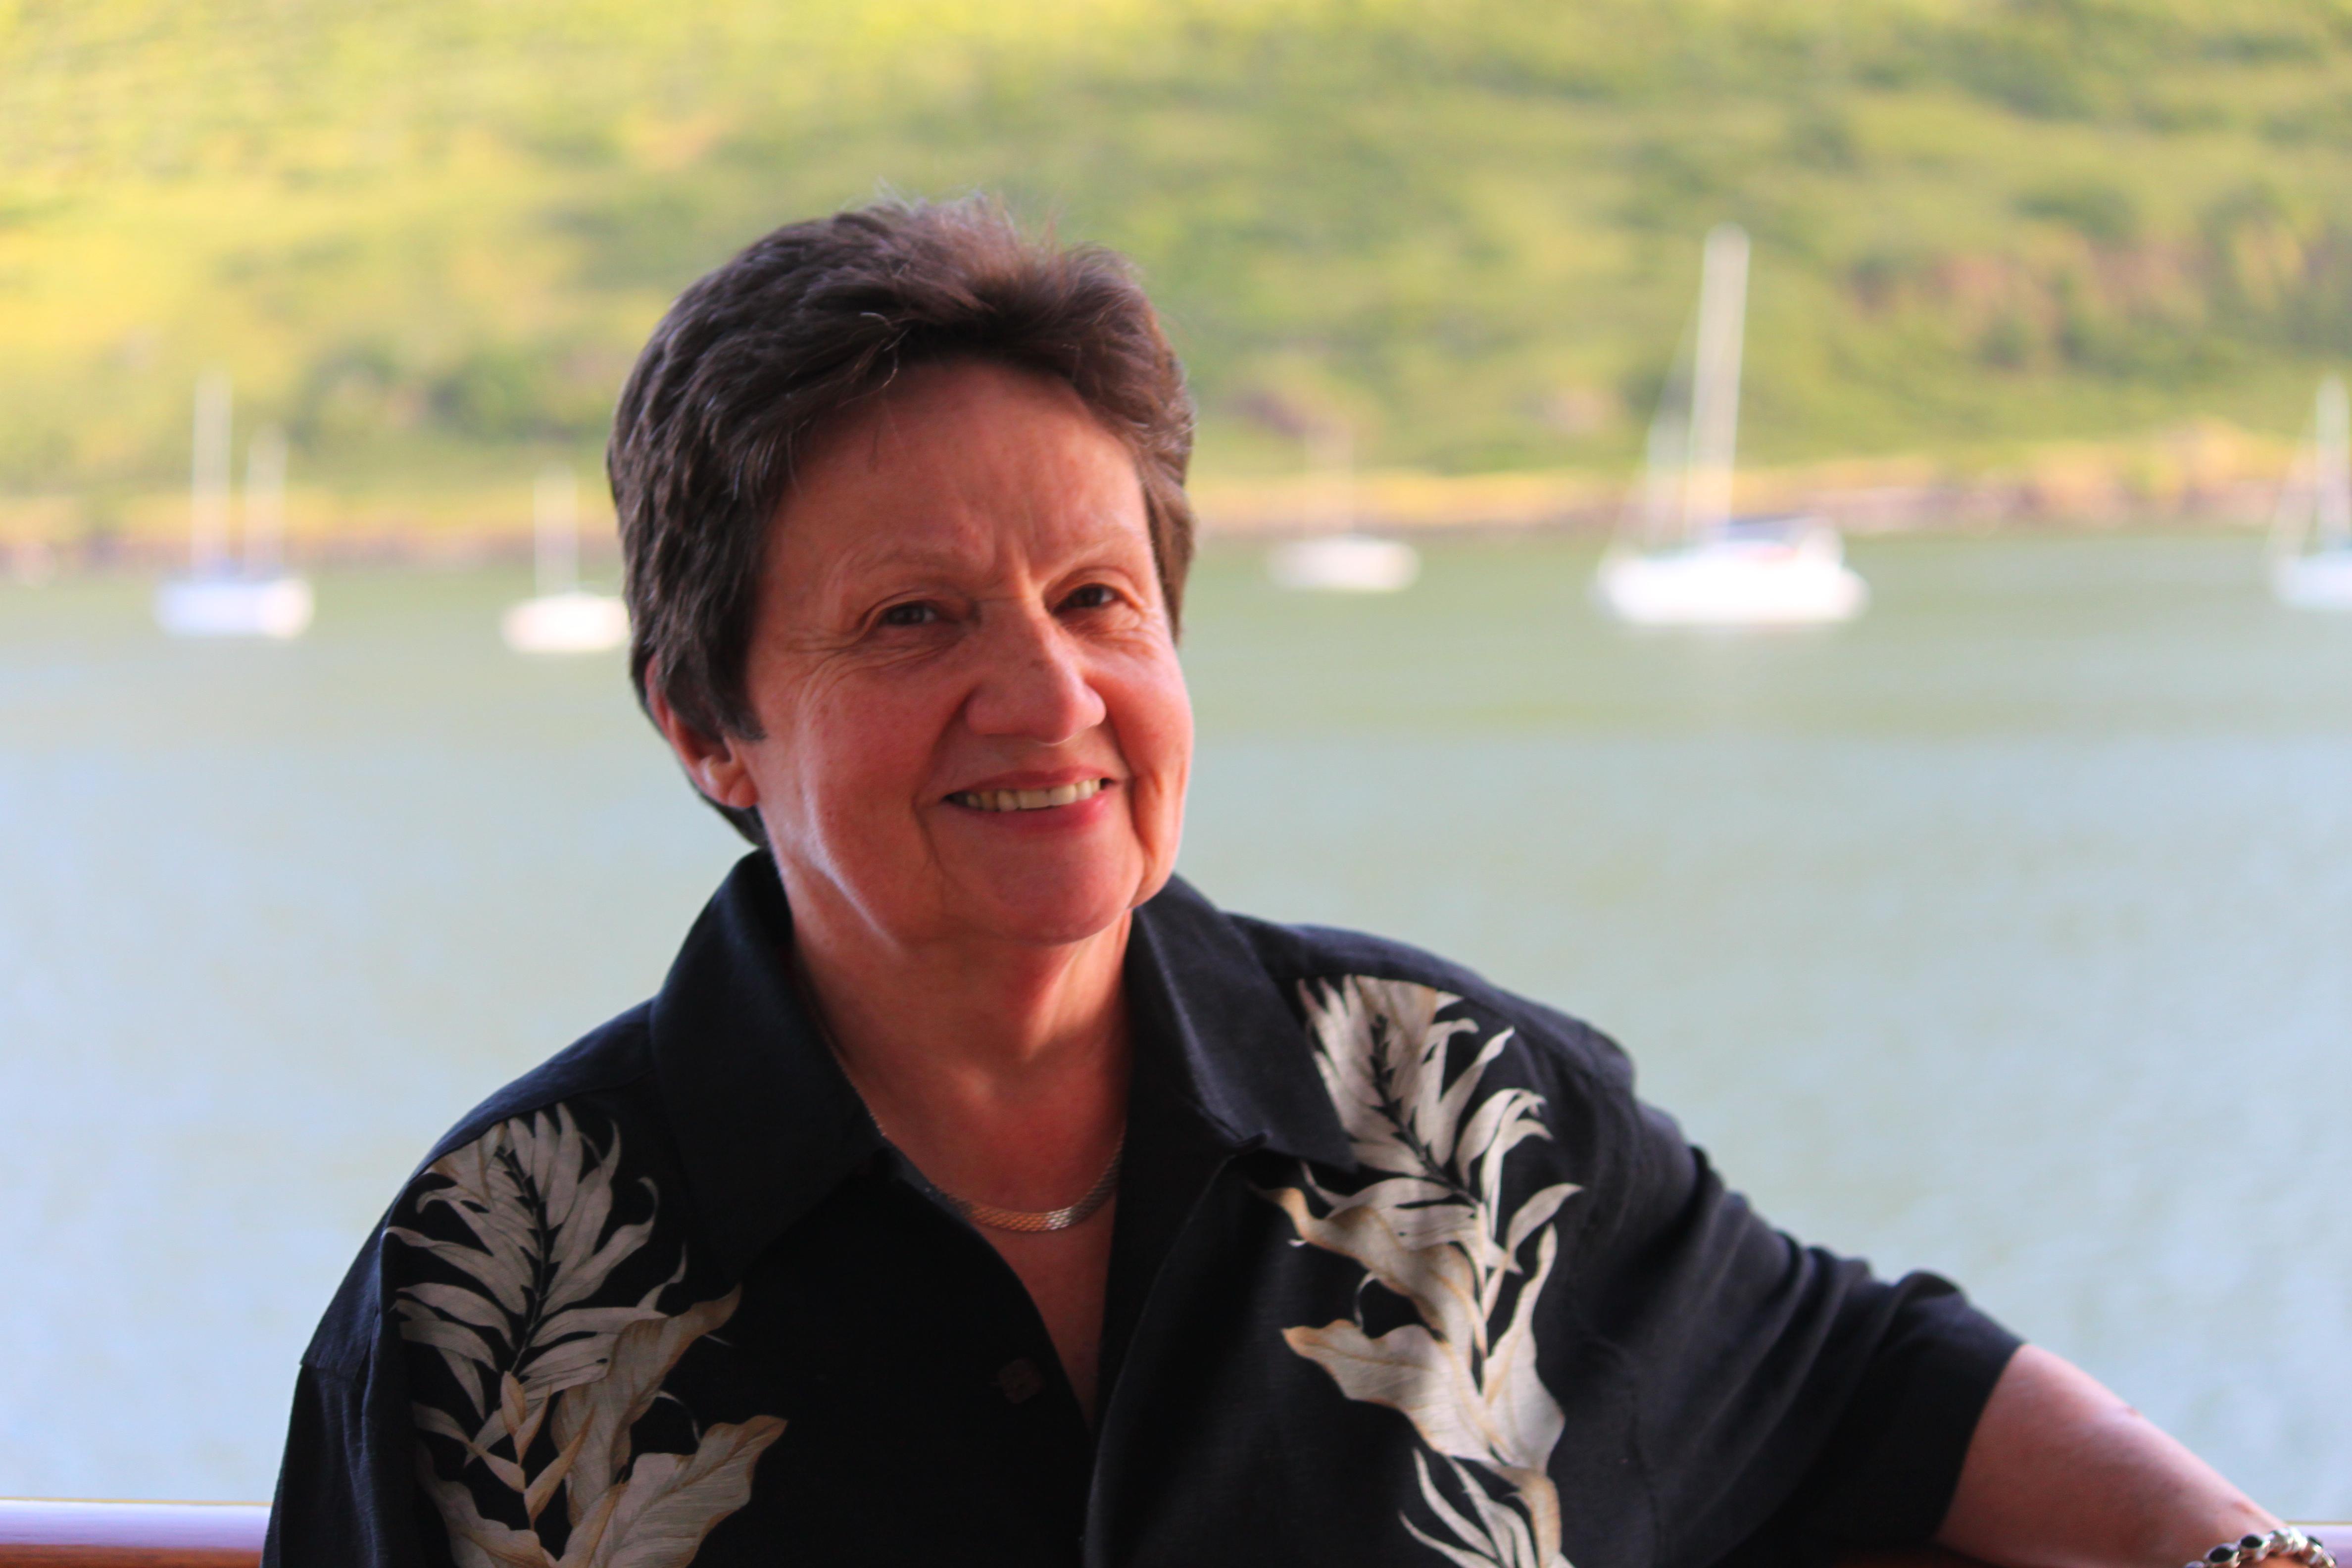 Rev. Cathie Sinfield